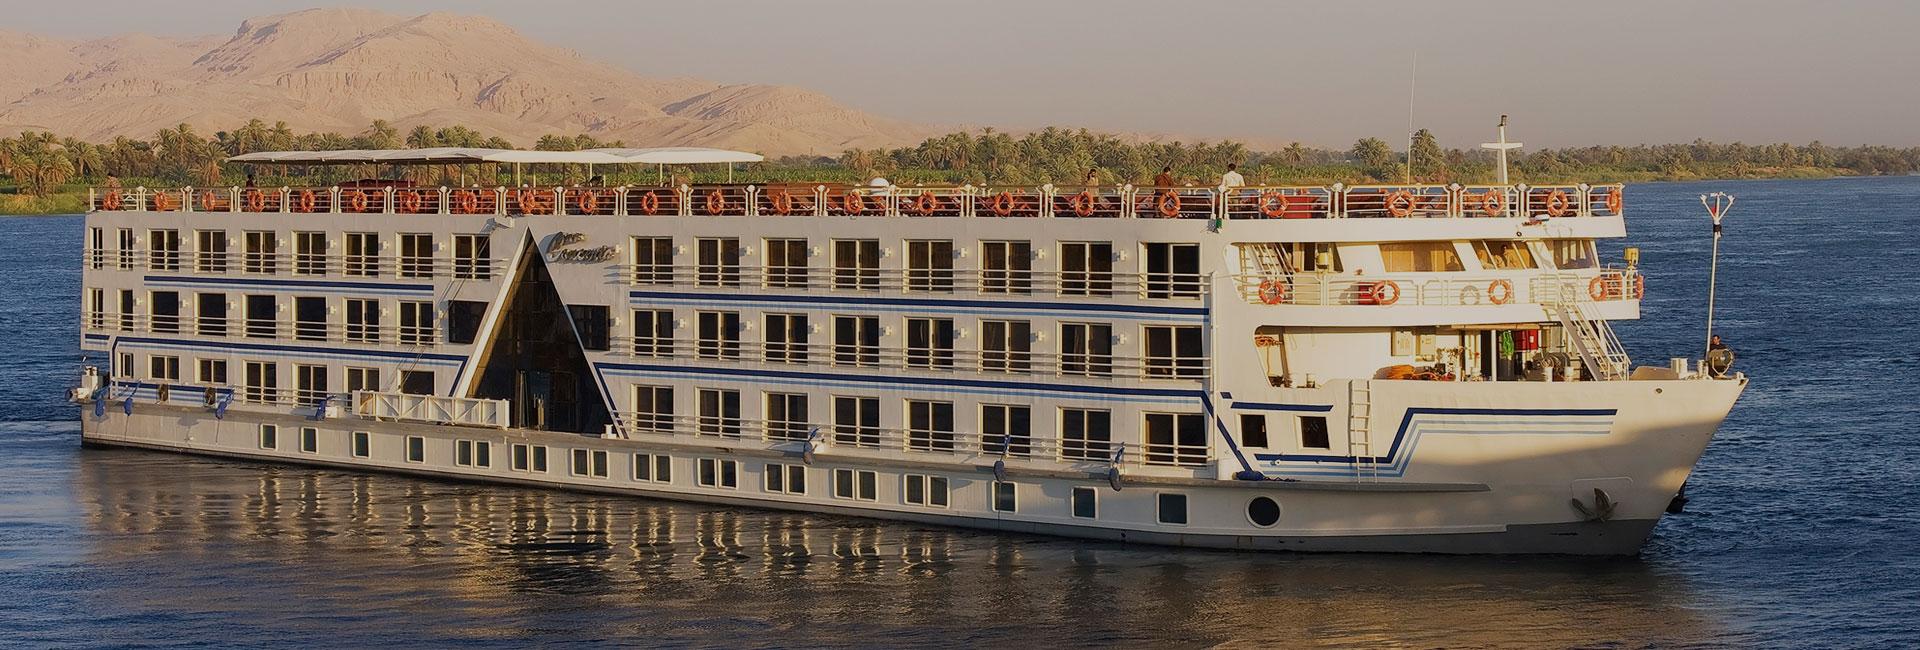 Cairo, Hurghada and Nile Cruise